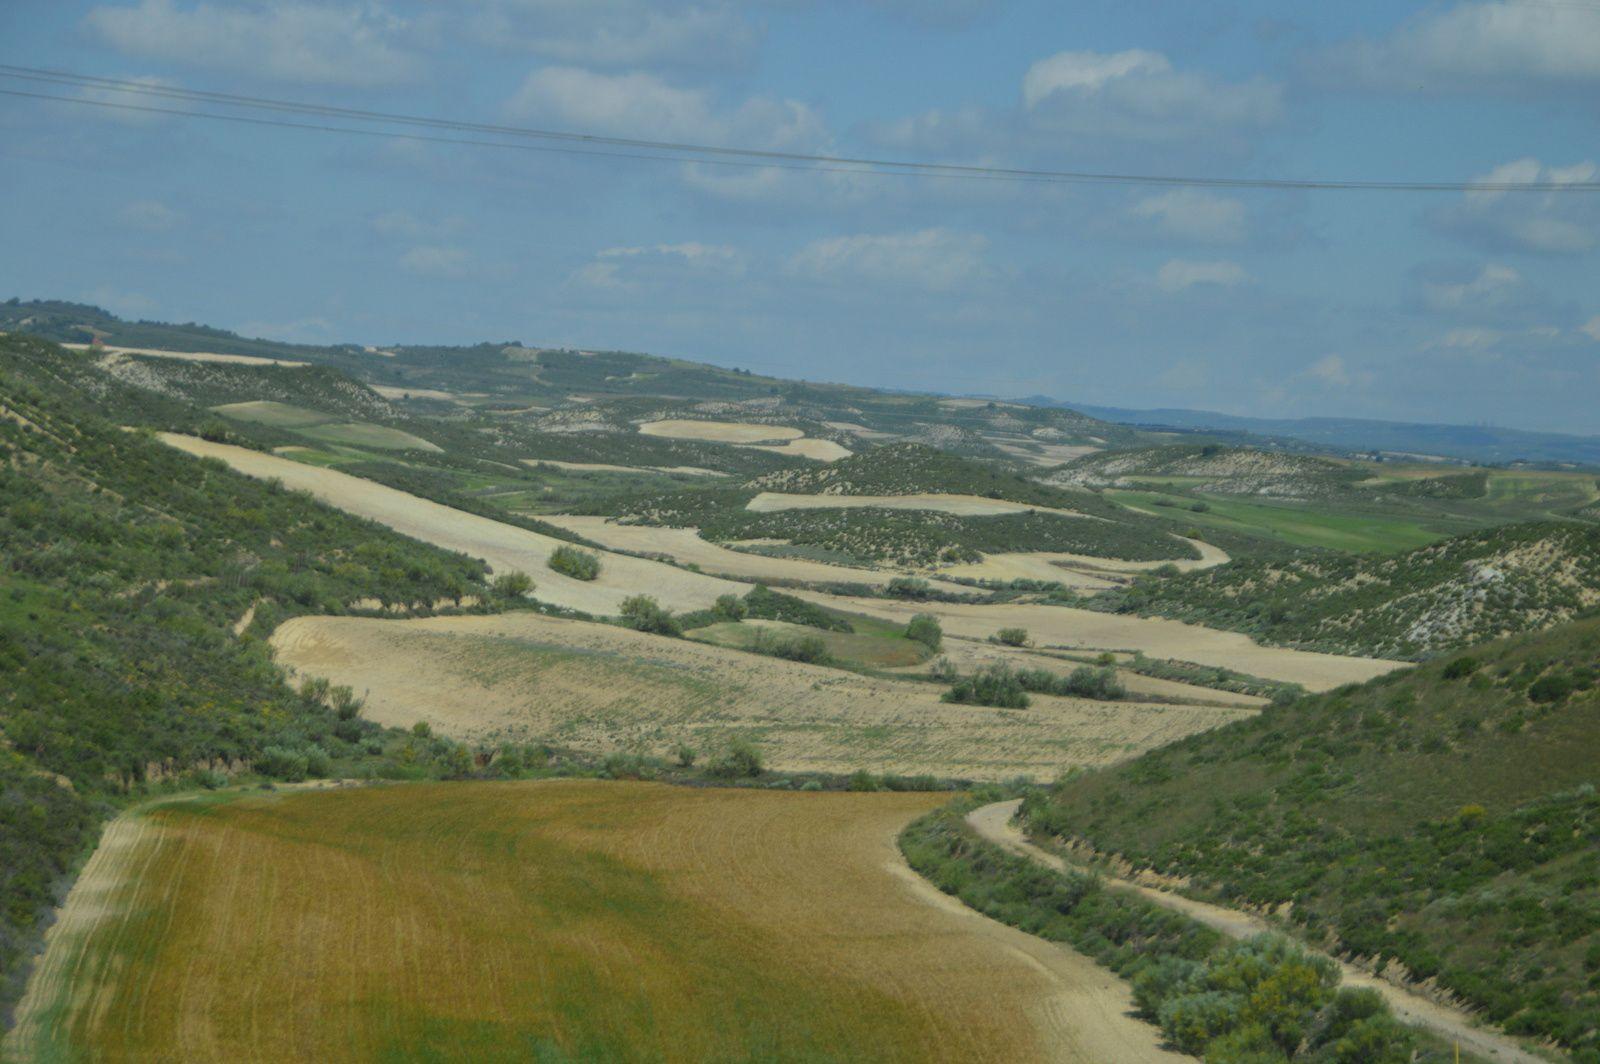 Voyage en Espagne (2) Pau - Saragosse